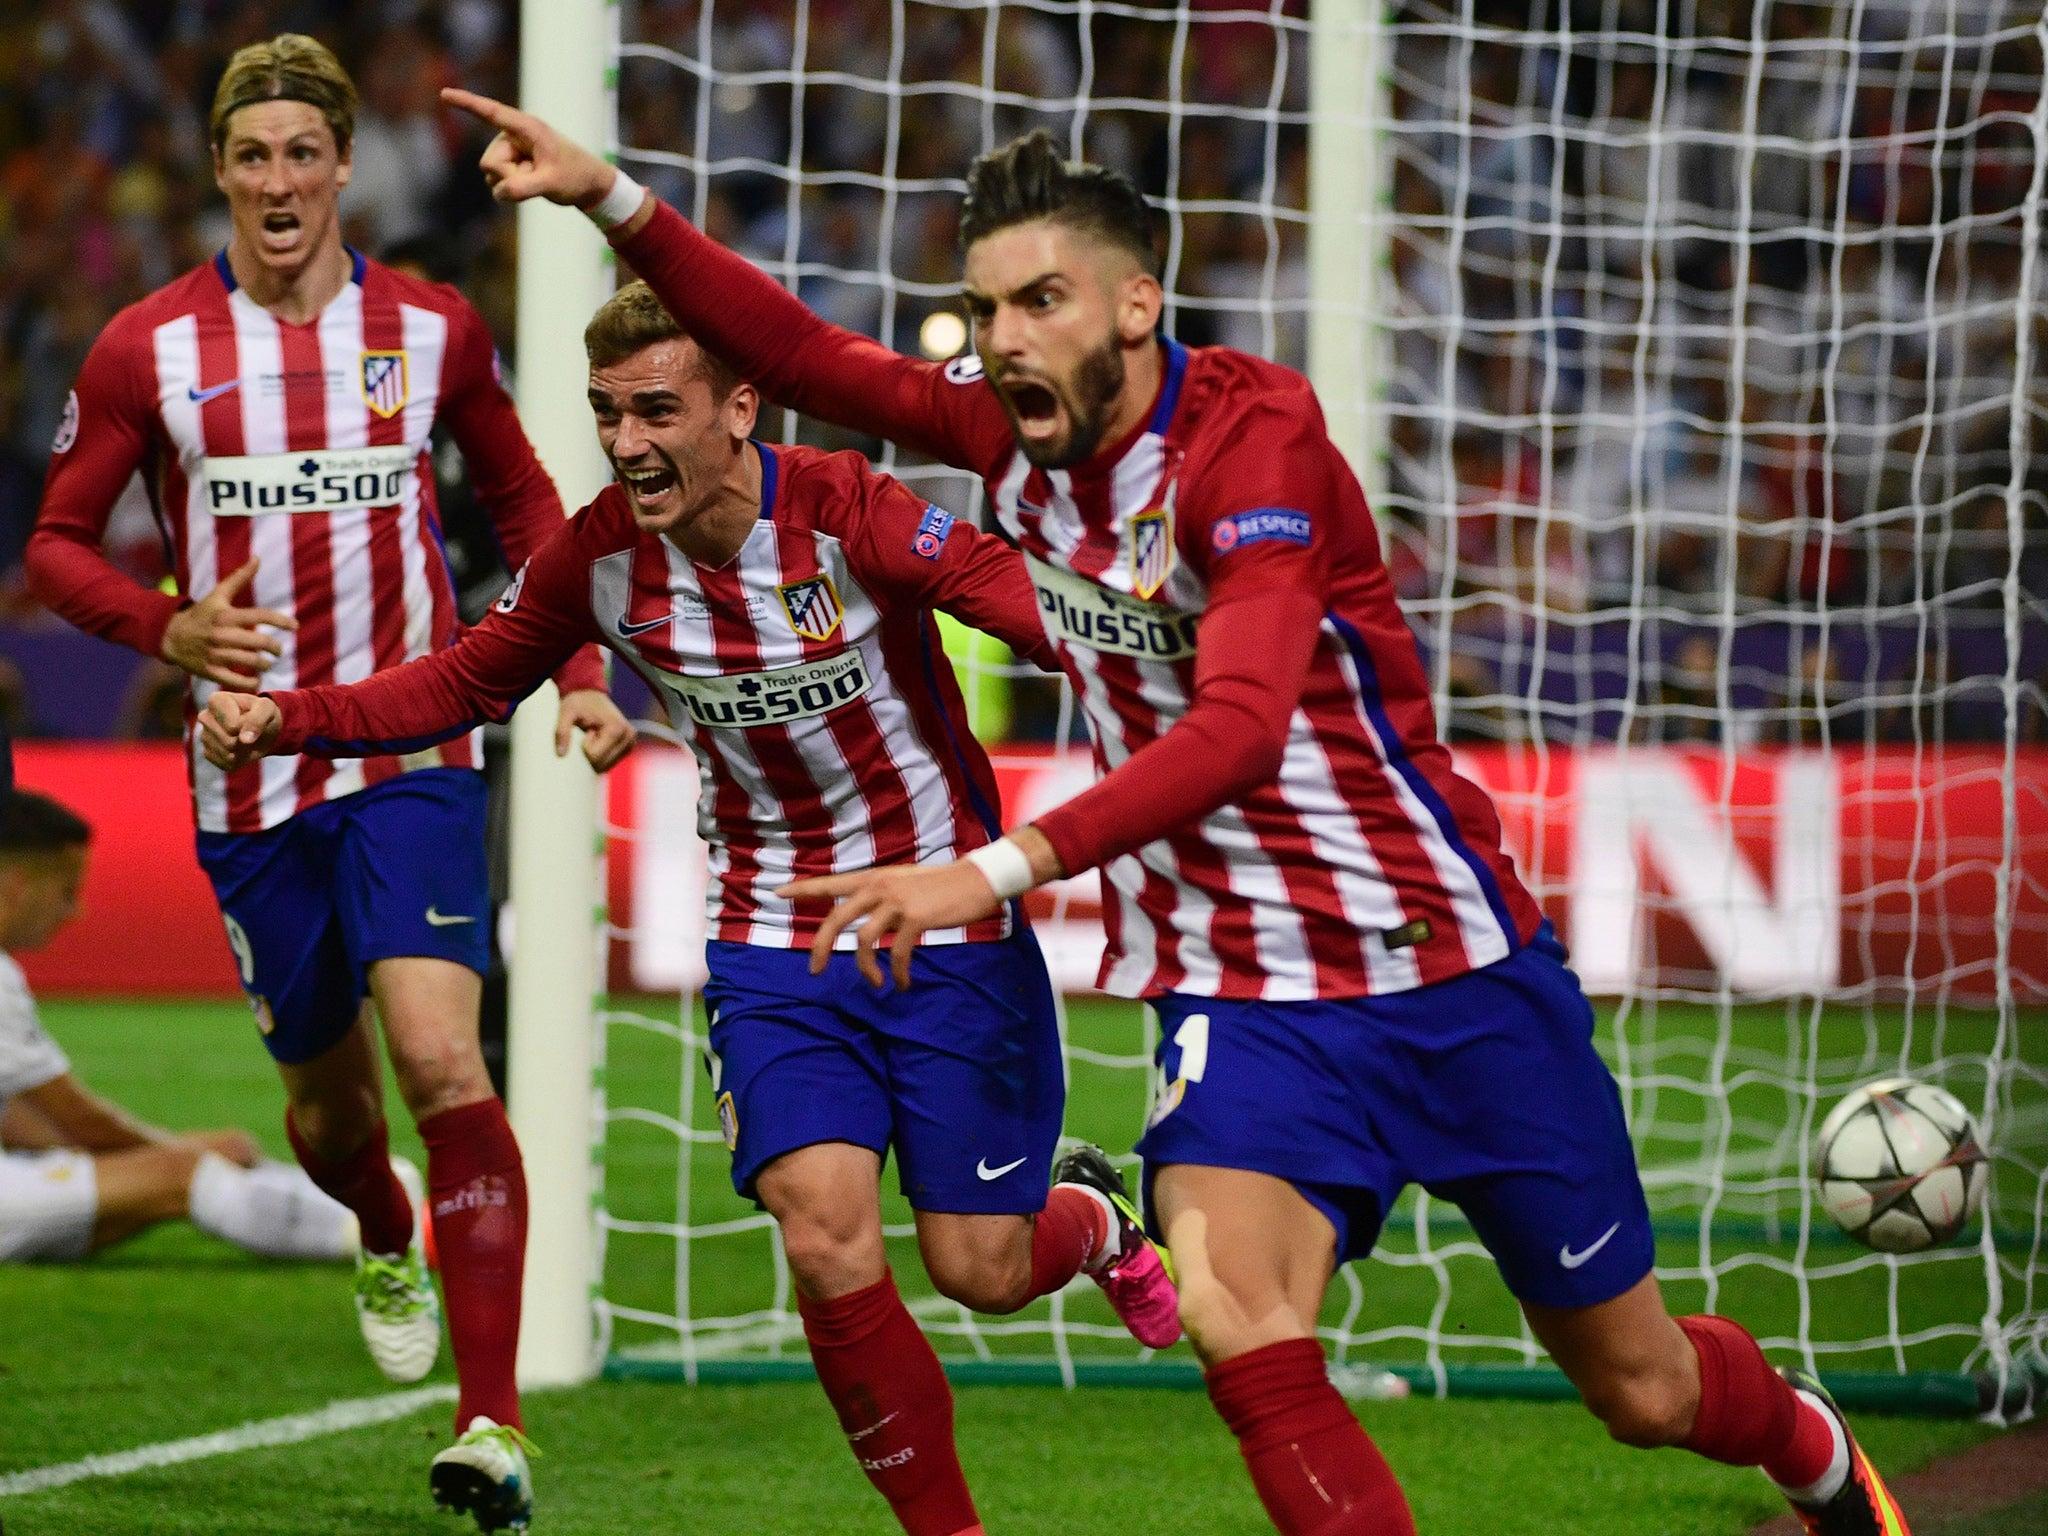 Champions League final Yannick Ferreira Carrasco celebrates